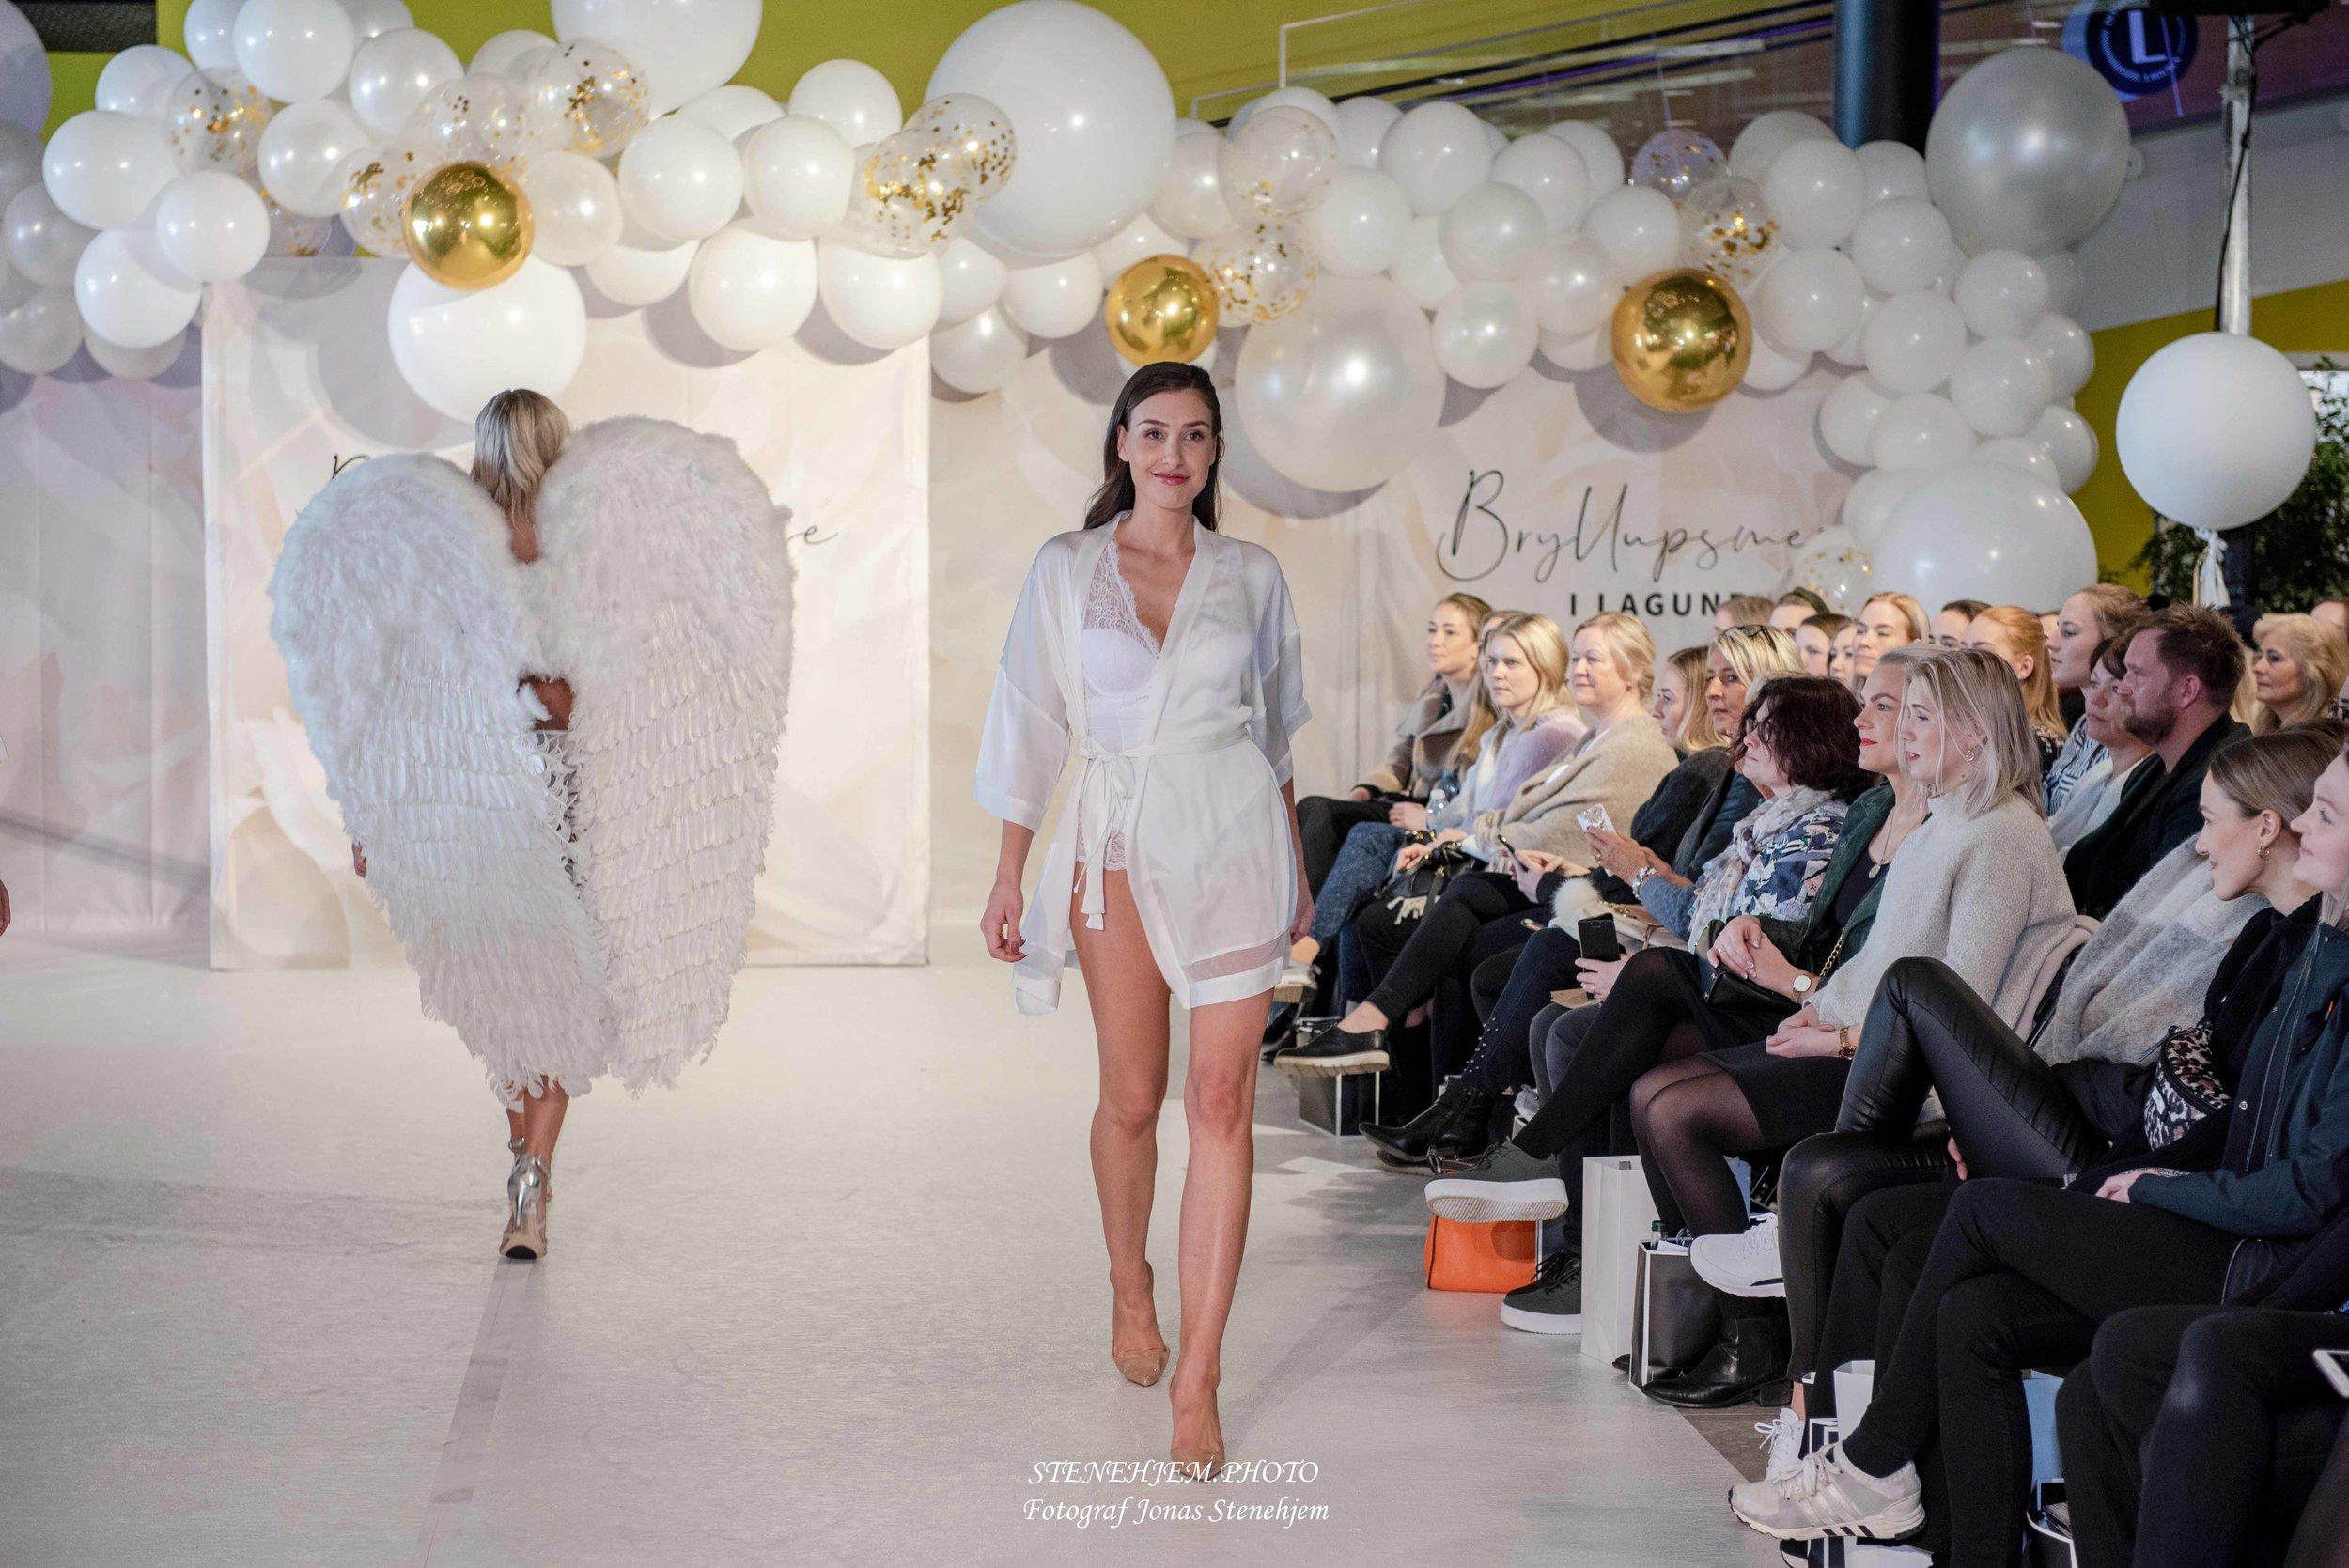 Bryllupsmesse_Lagunen_mittaltweddingfair__054.jpg